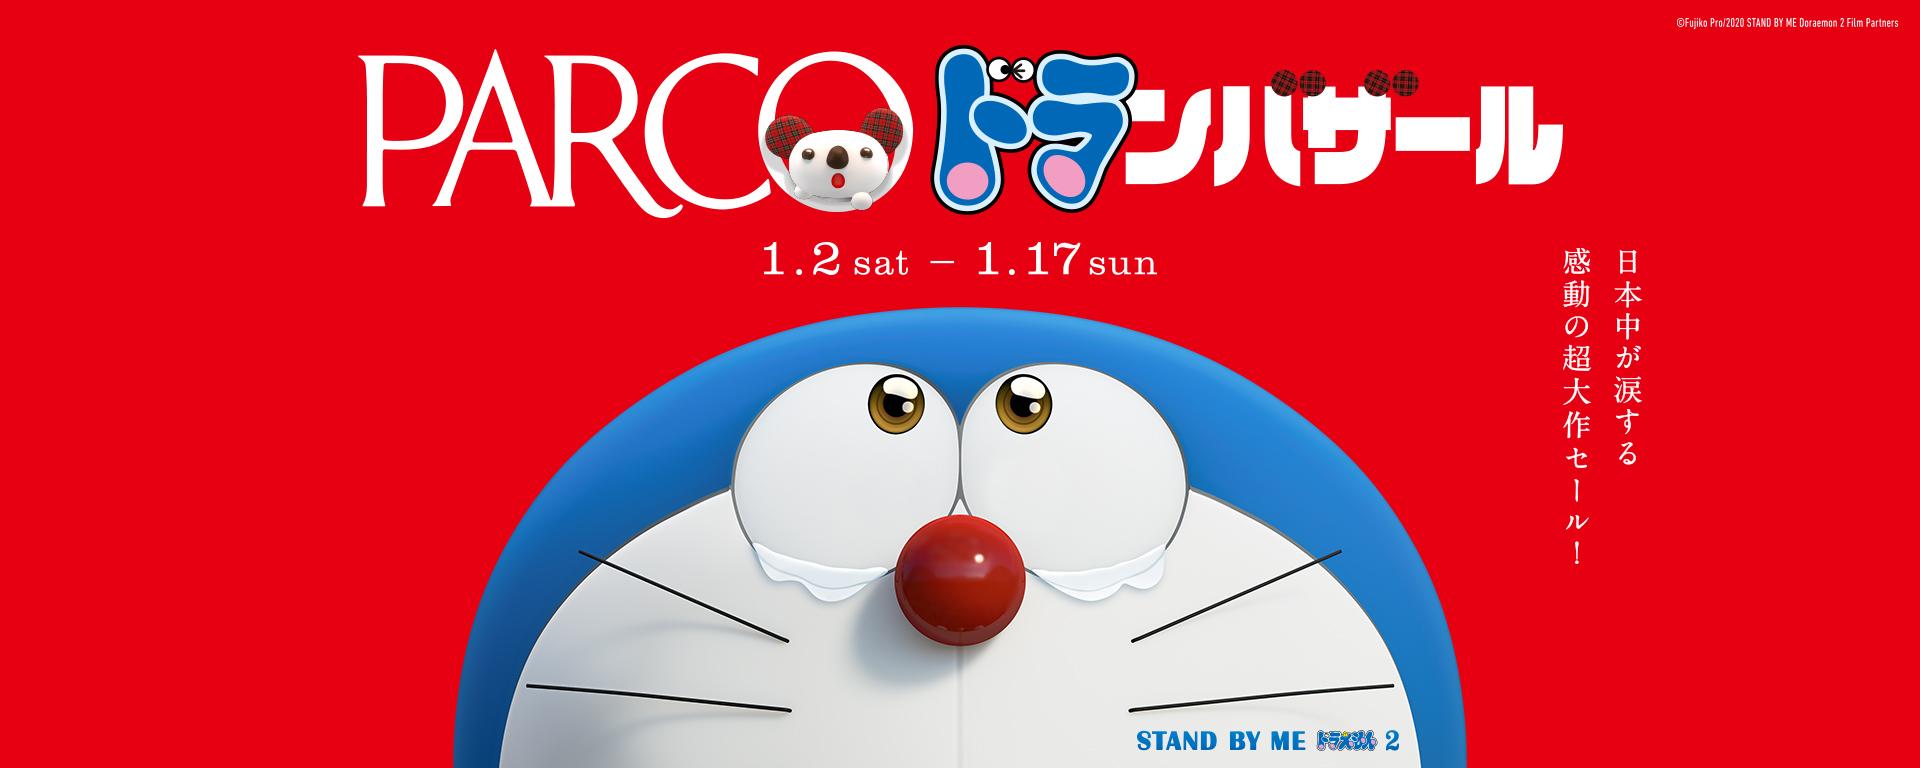 PARCO ドランバザール│参加ショップ一覧